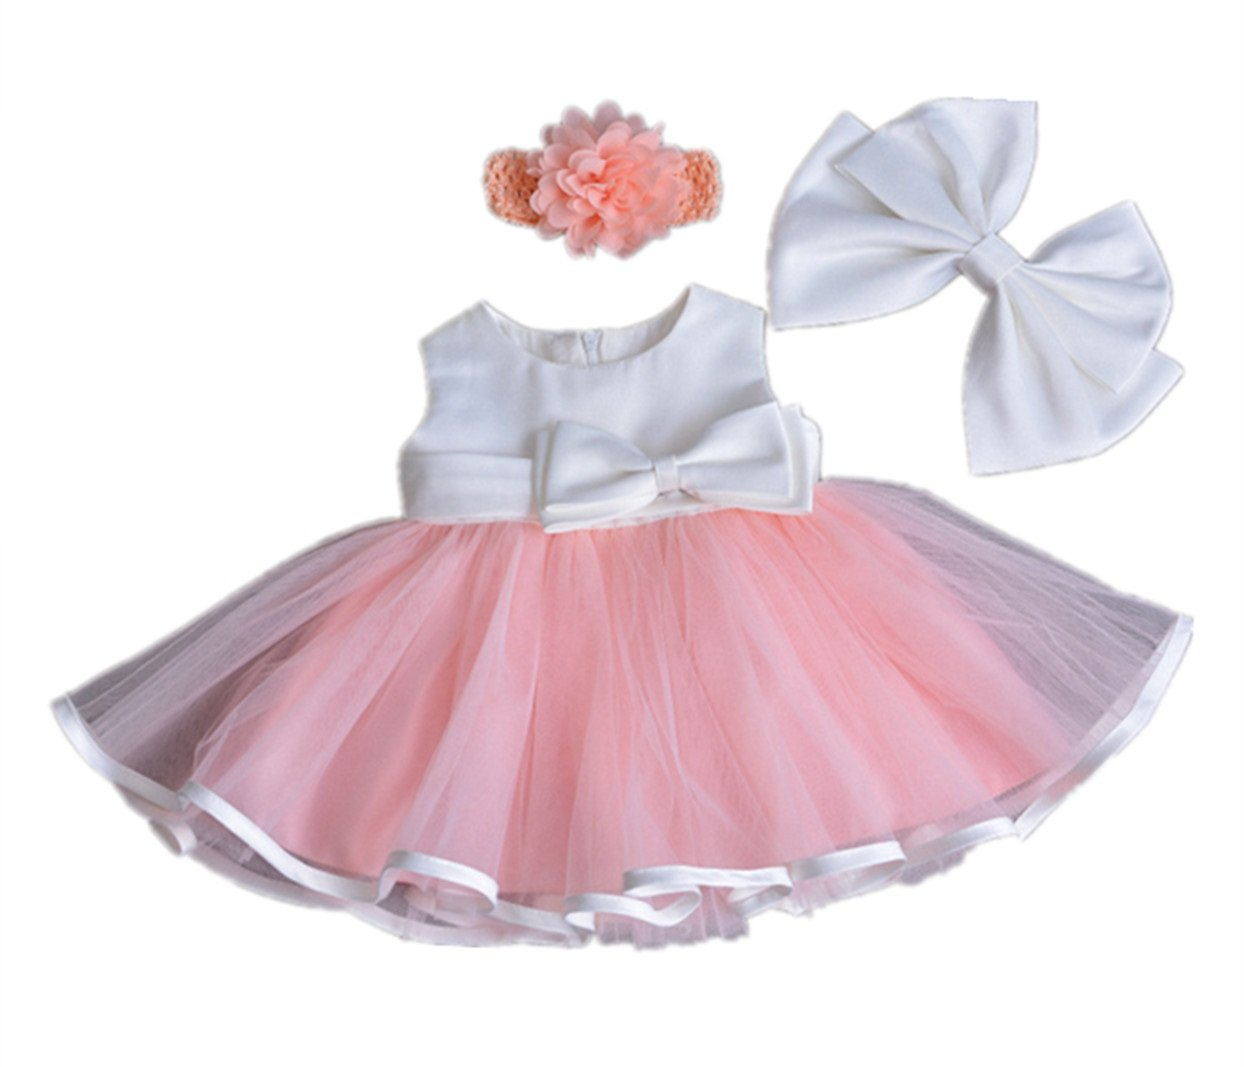 HX Baby Girls Princess Pink Sleeveless Gauze Wedding Birthday Party Dresses with Headband (Pink, 18M/12-18 Months)